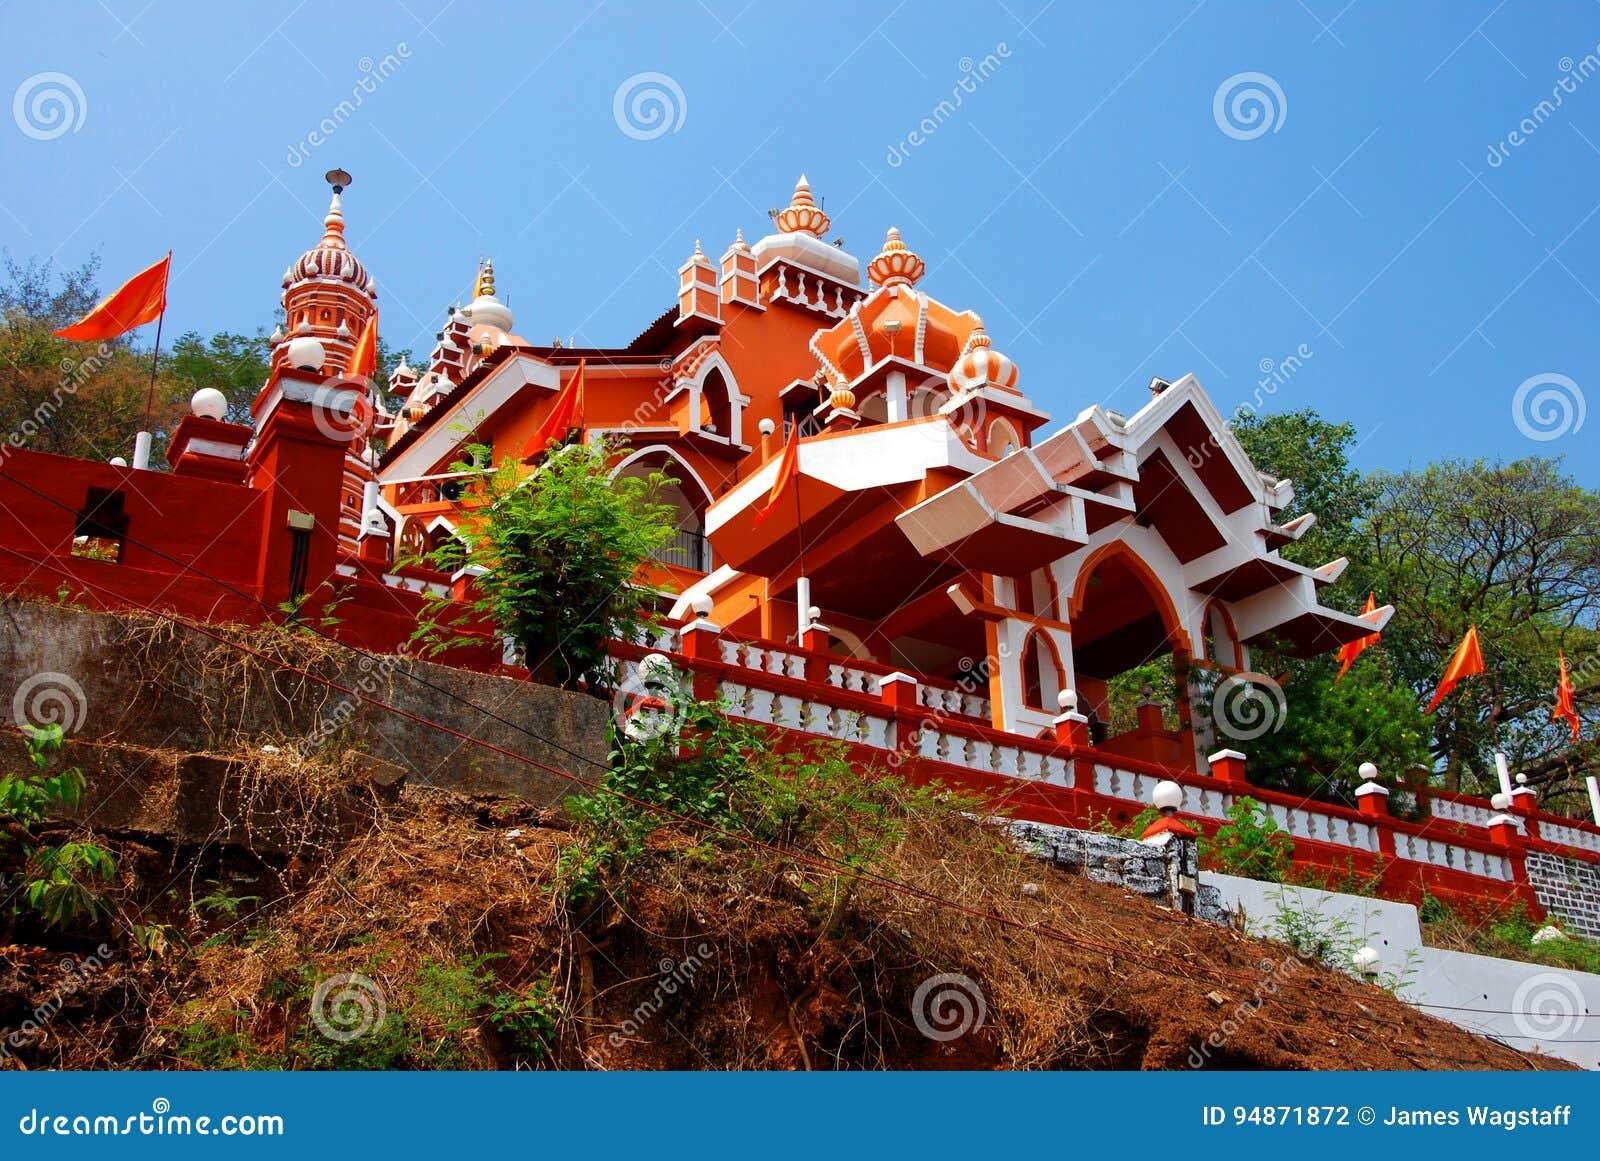 Marutitempel in Panjim, gewijd aan de Hindoese Aapgod Hanuman